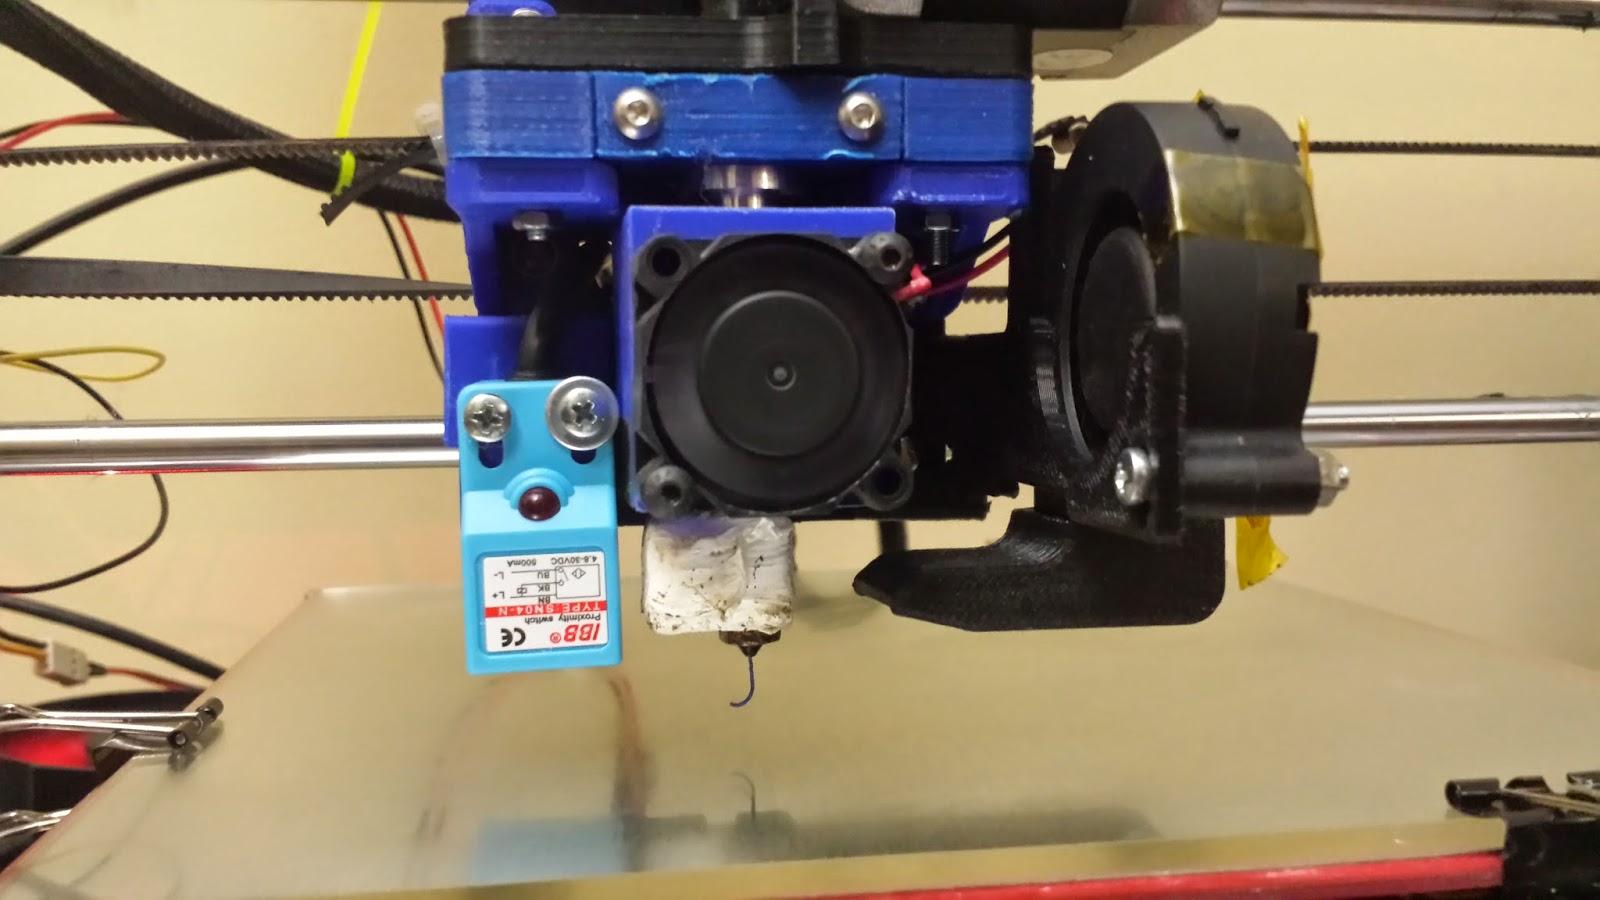 Induction probe setup on the Aluminum 3DPrintMi